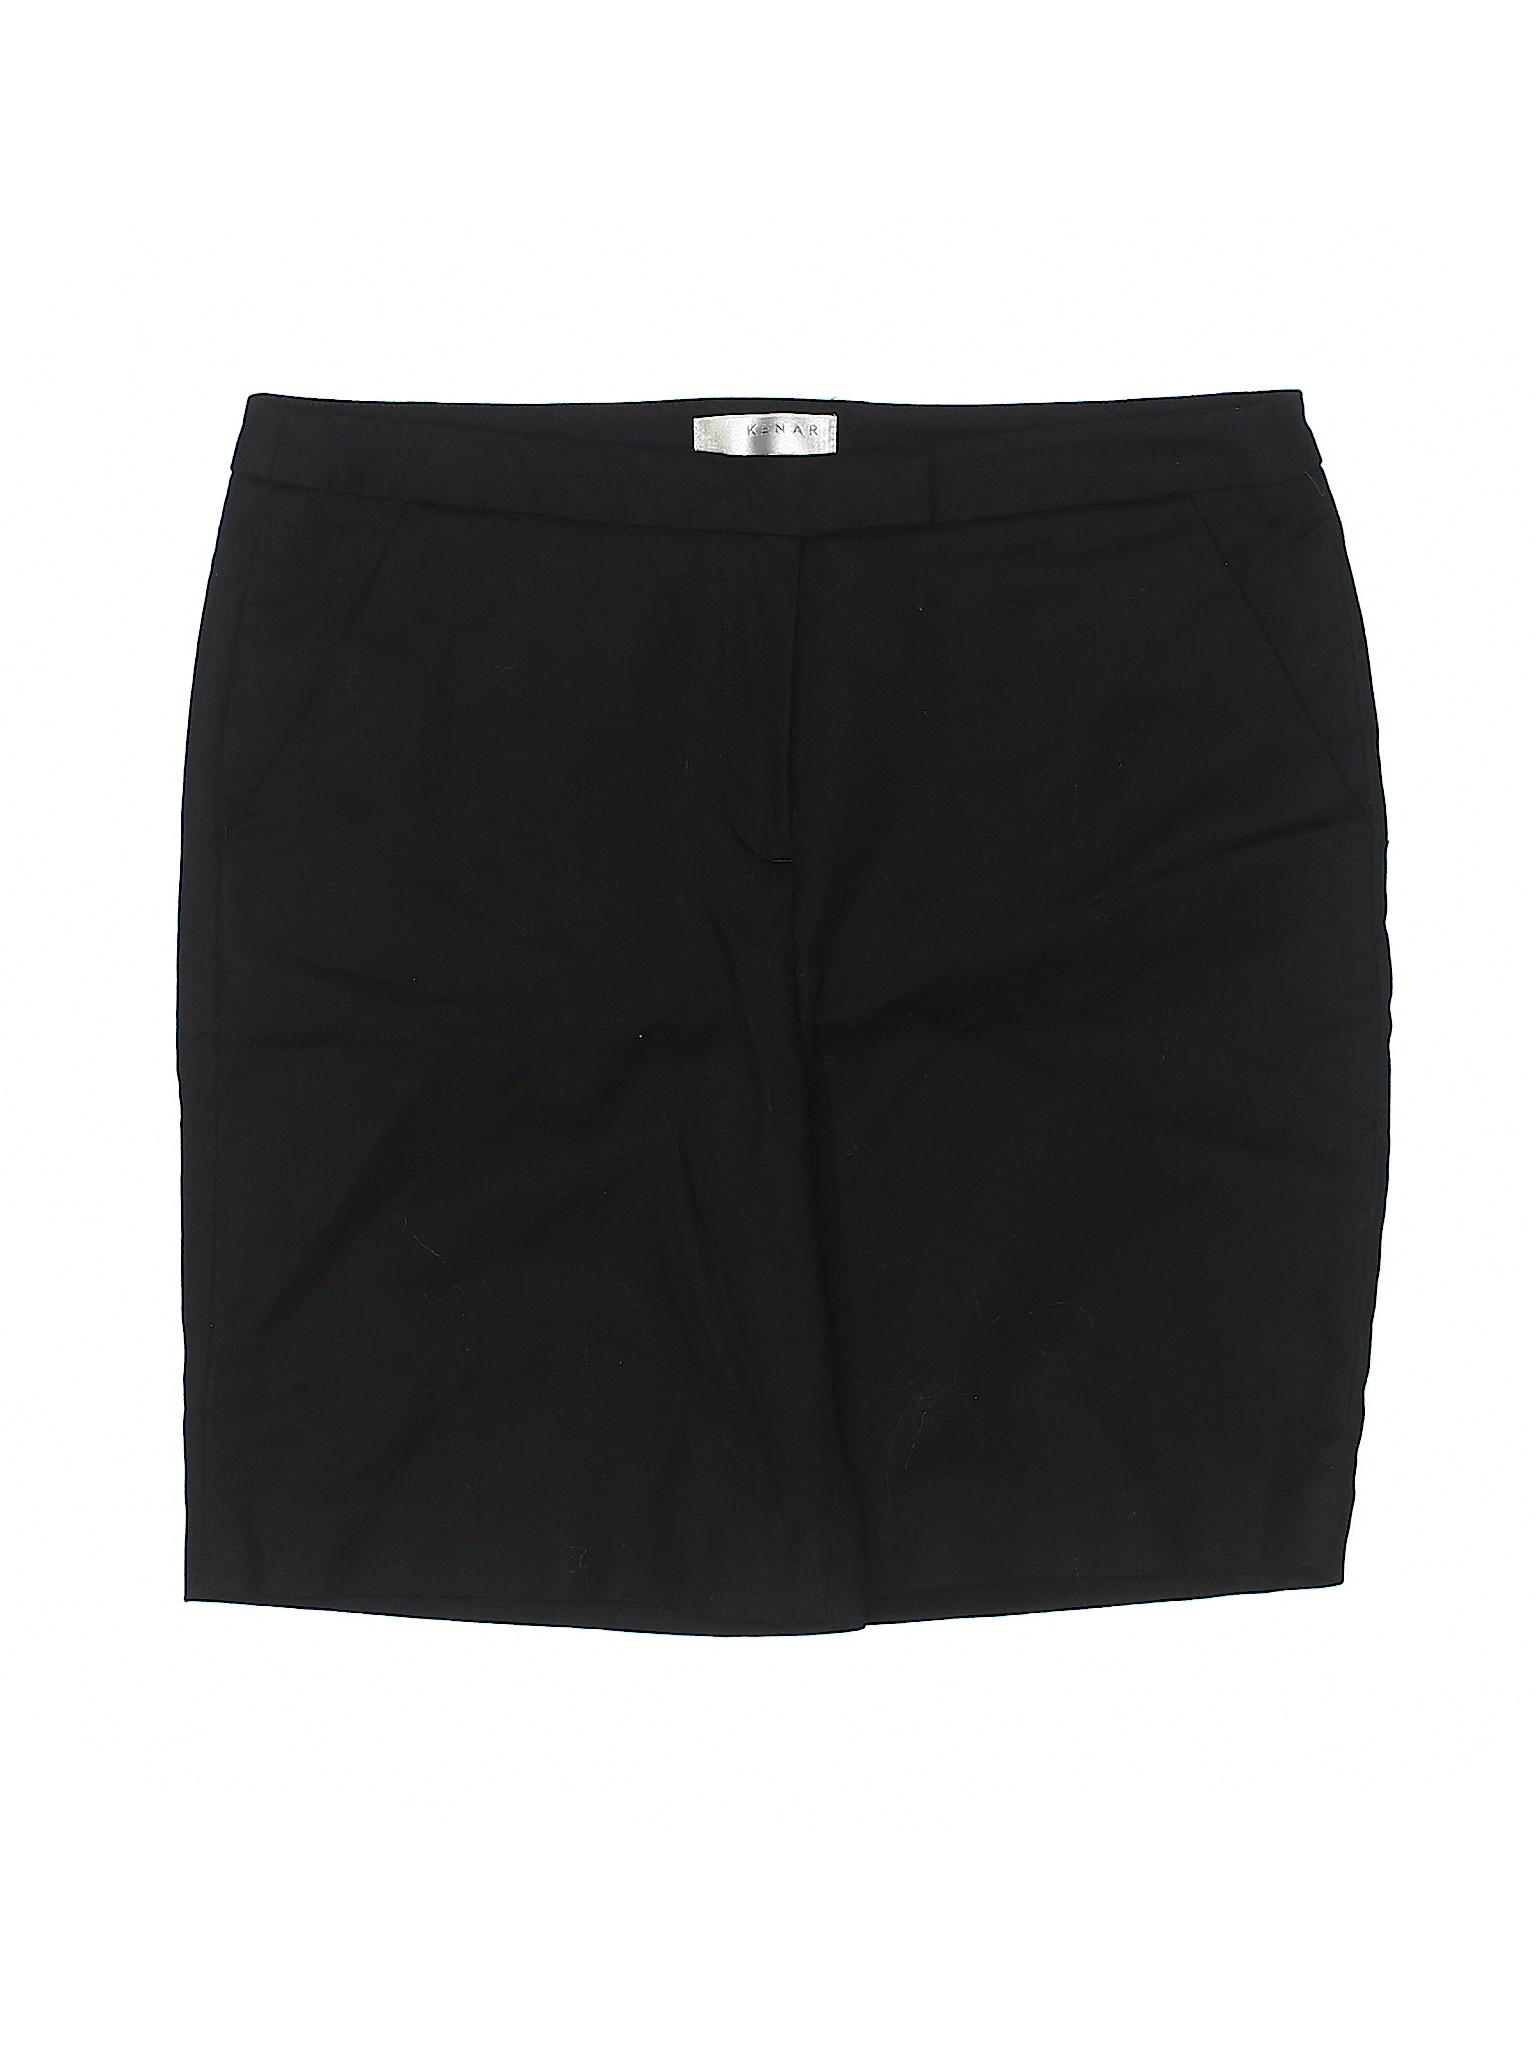 Khaki Boutique Kenar Shorts Kenar Boutique Boutique Khaki Shorts Kenar Khaki Kenar Boutique Shorts pOWOdnPx1